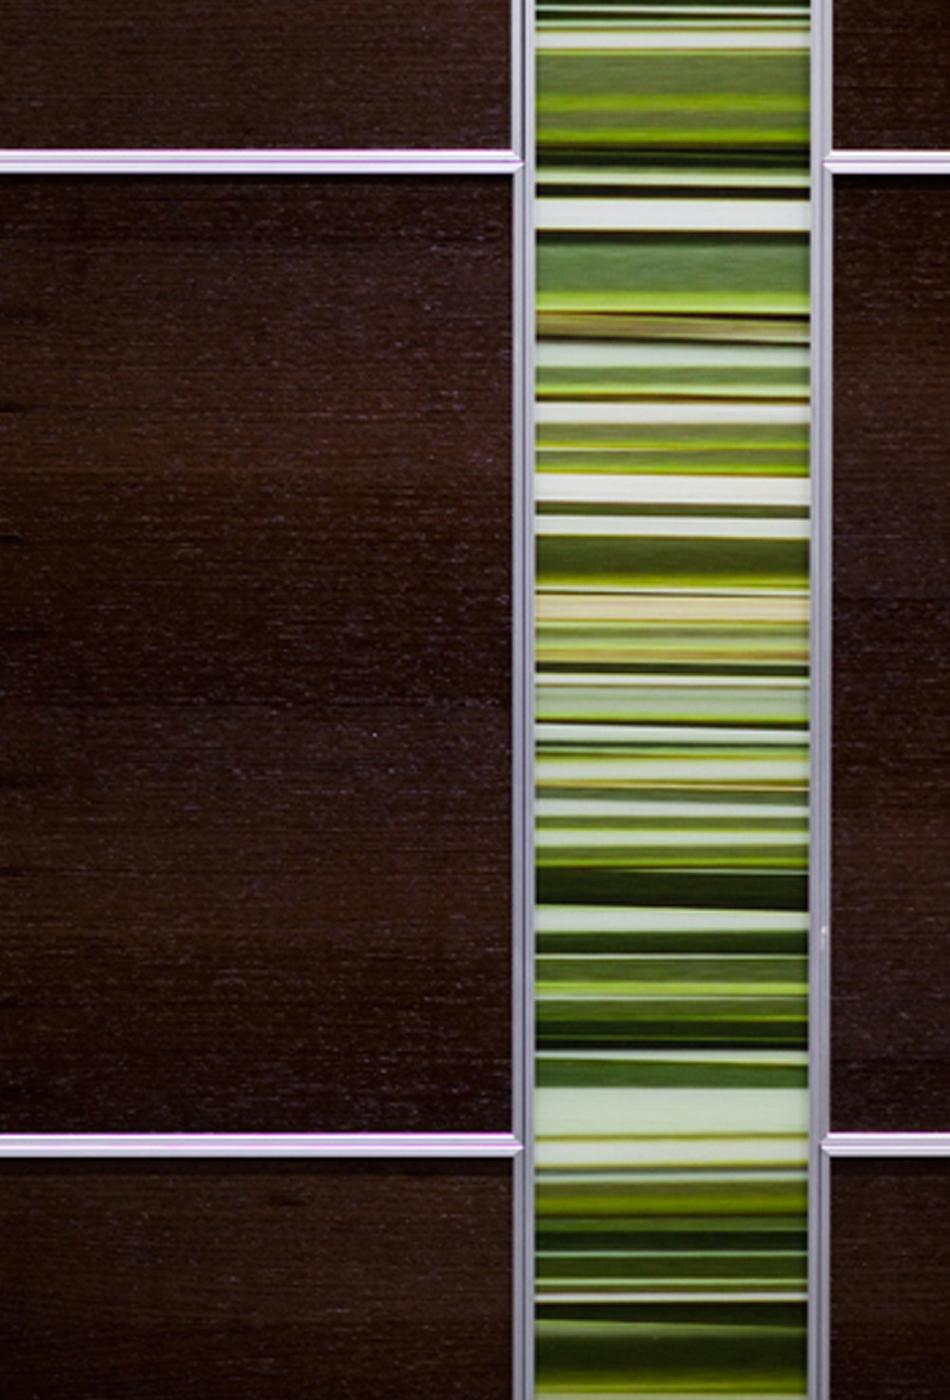 CABS SCALE GRASS CLOSE 8.28.2013.jpg